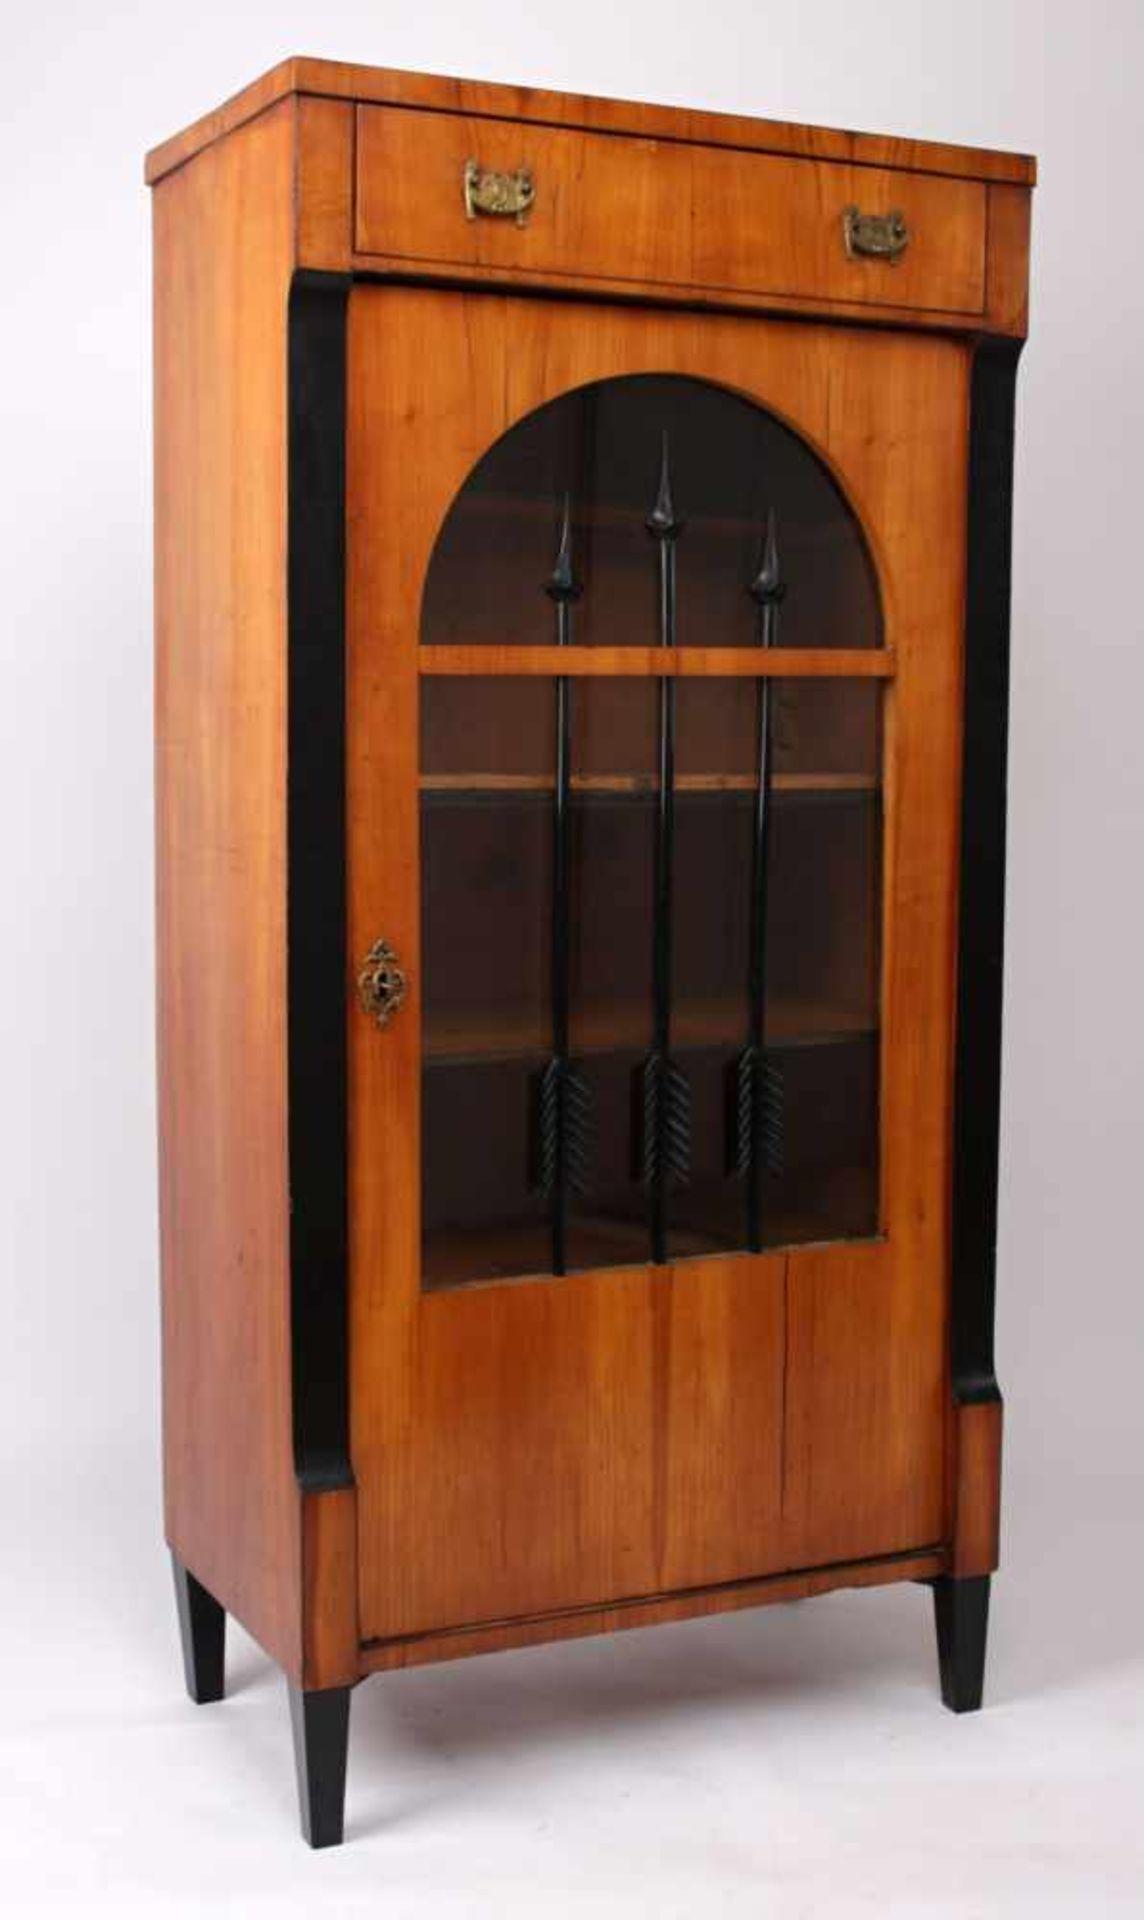 Los 42 - Biedermeier bookcase Middle Europe, 1st half of the 19th century, small Biedermeier bookcase, cherry